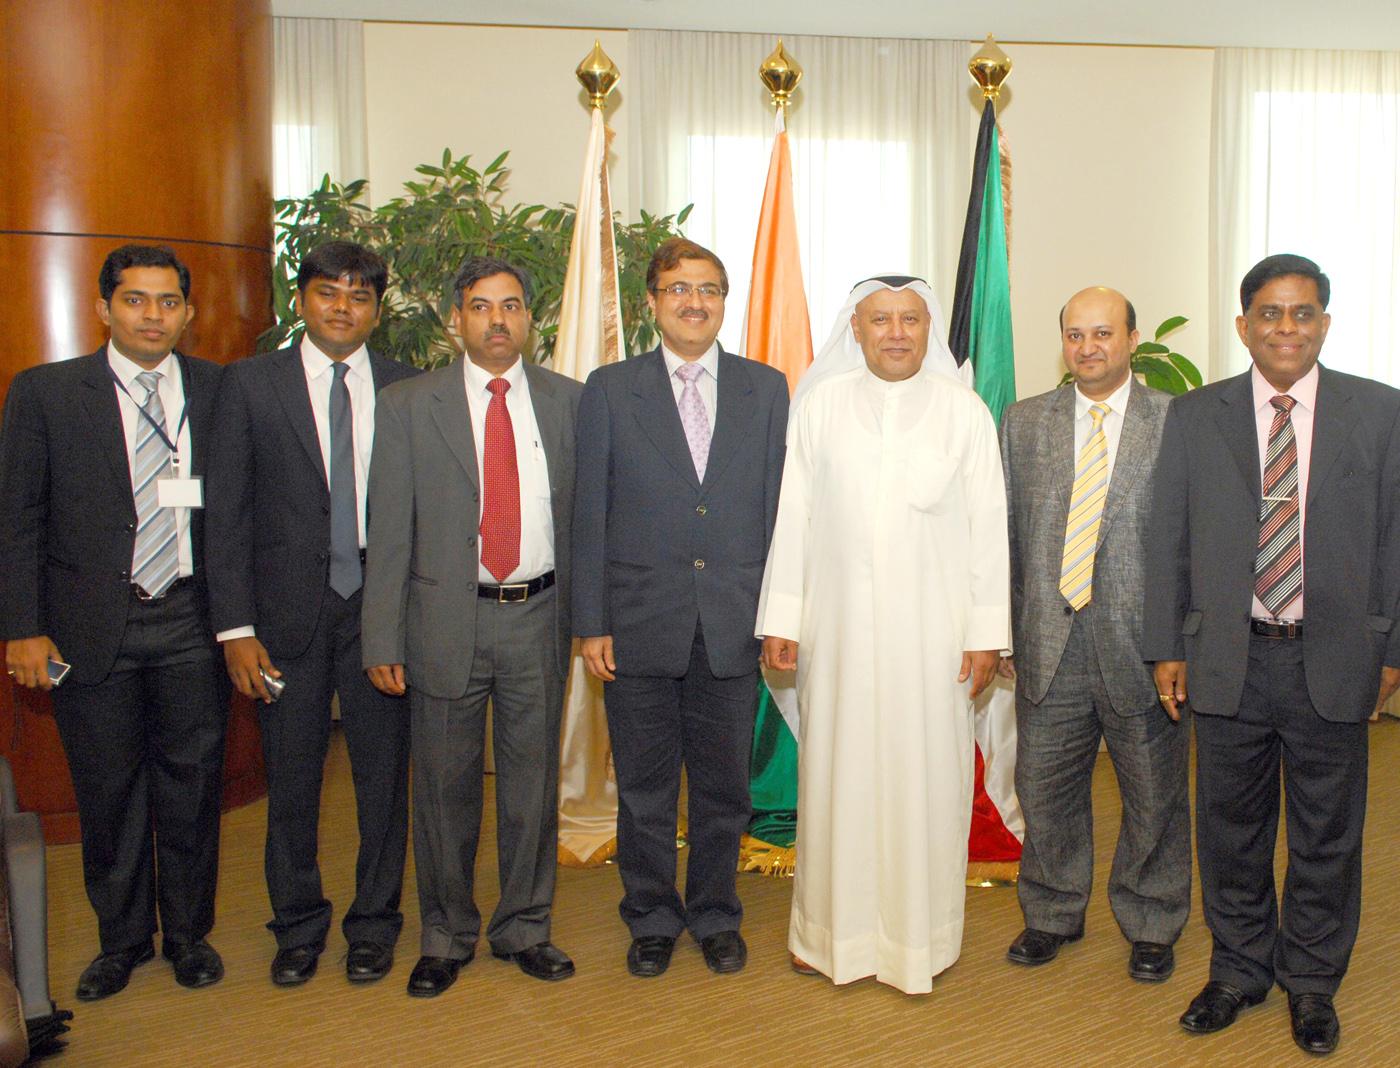 KUNA : Kuwaiti-Indian trade volume at KD 500 million in 2010